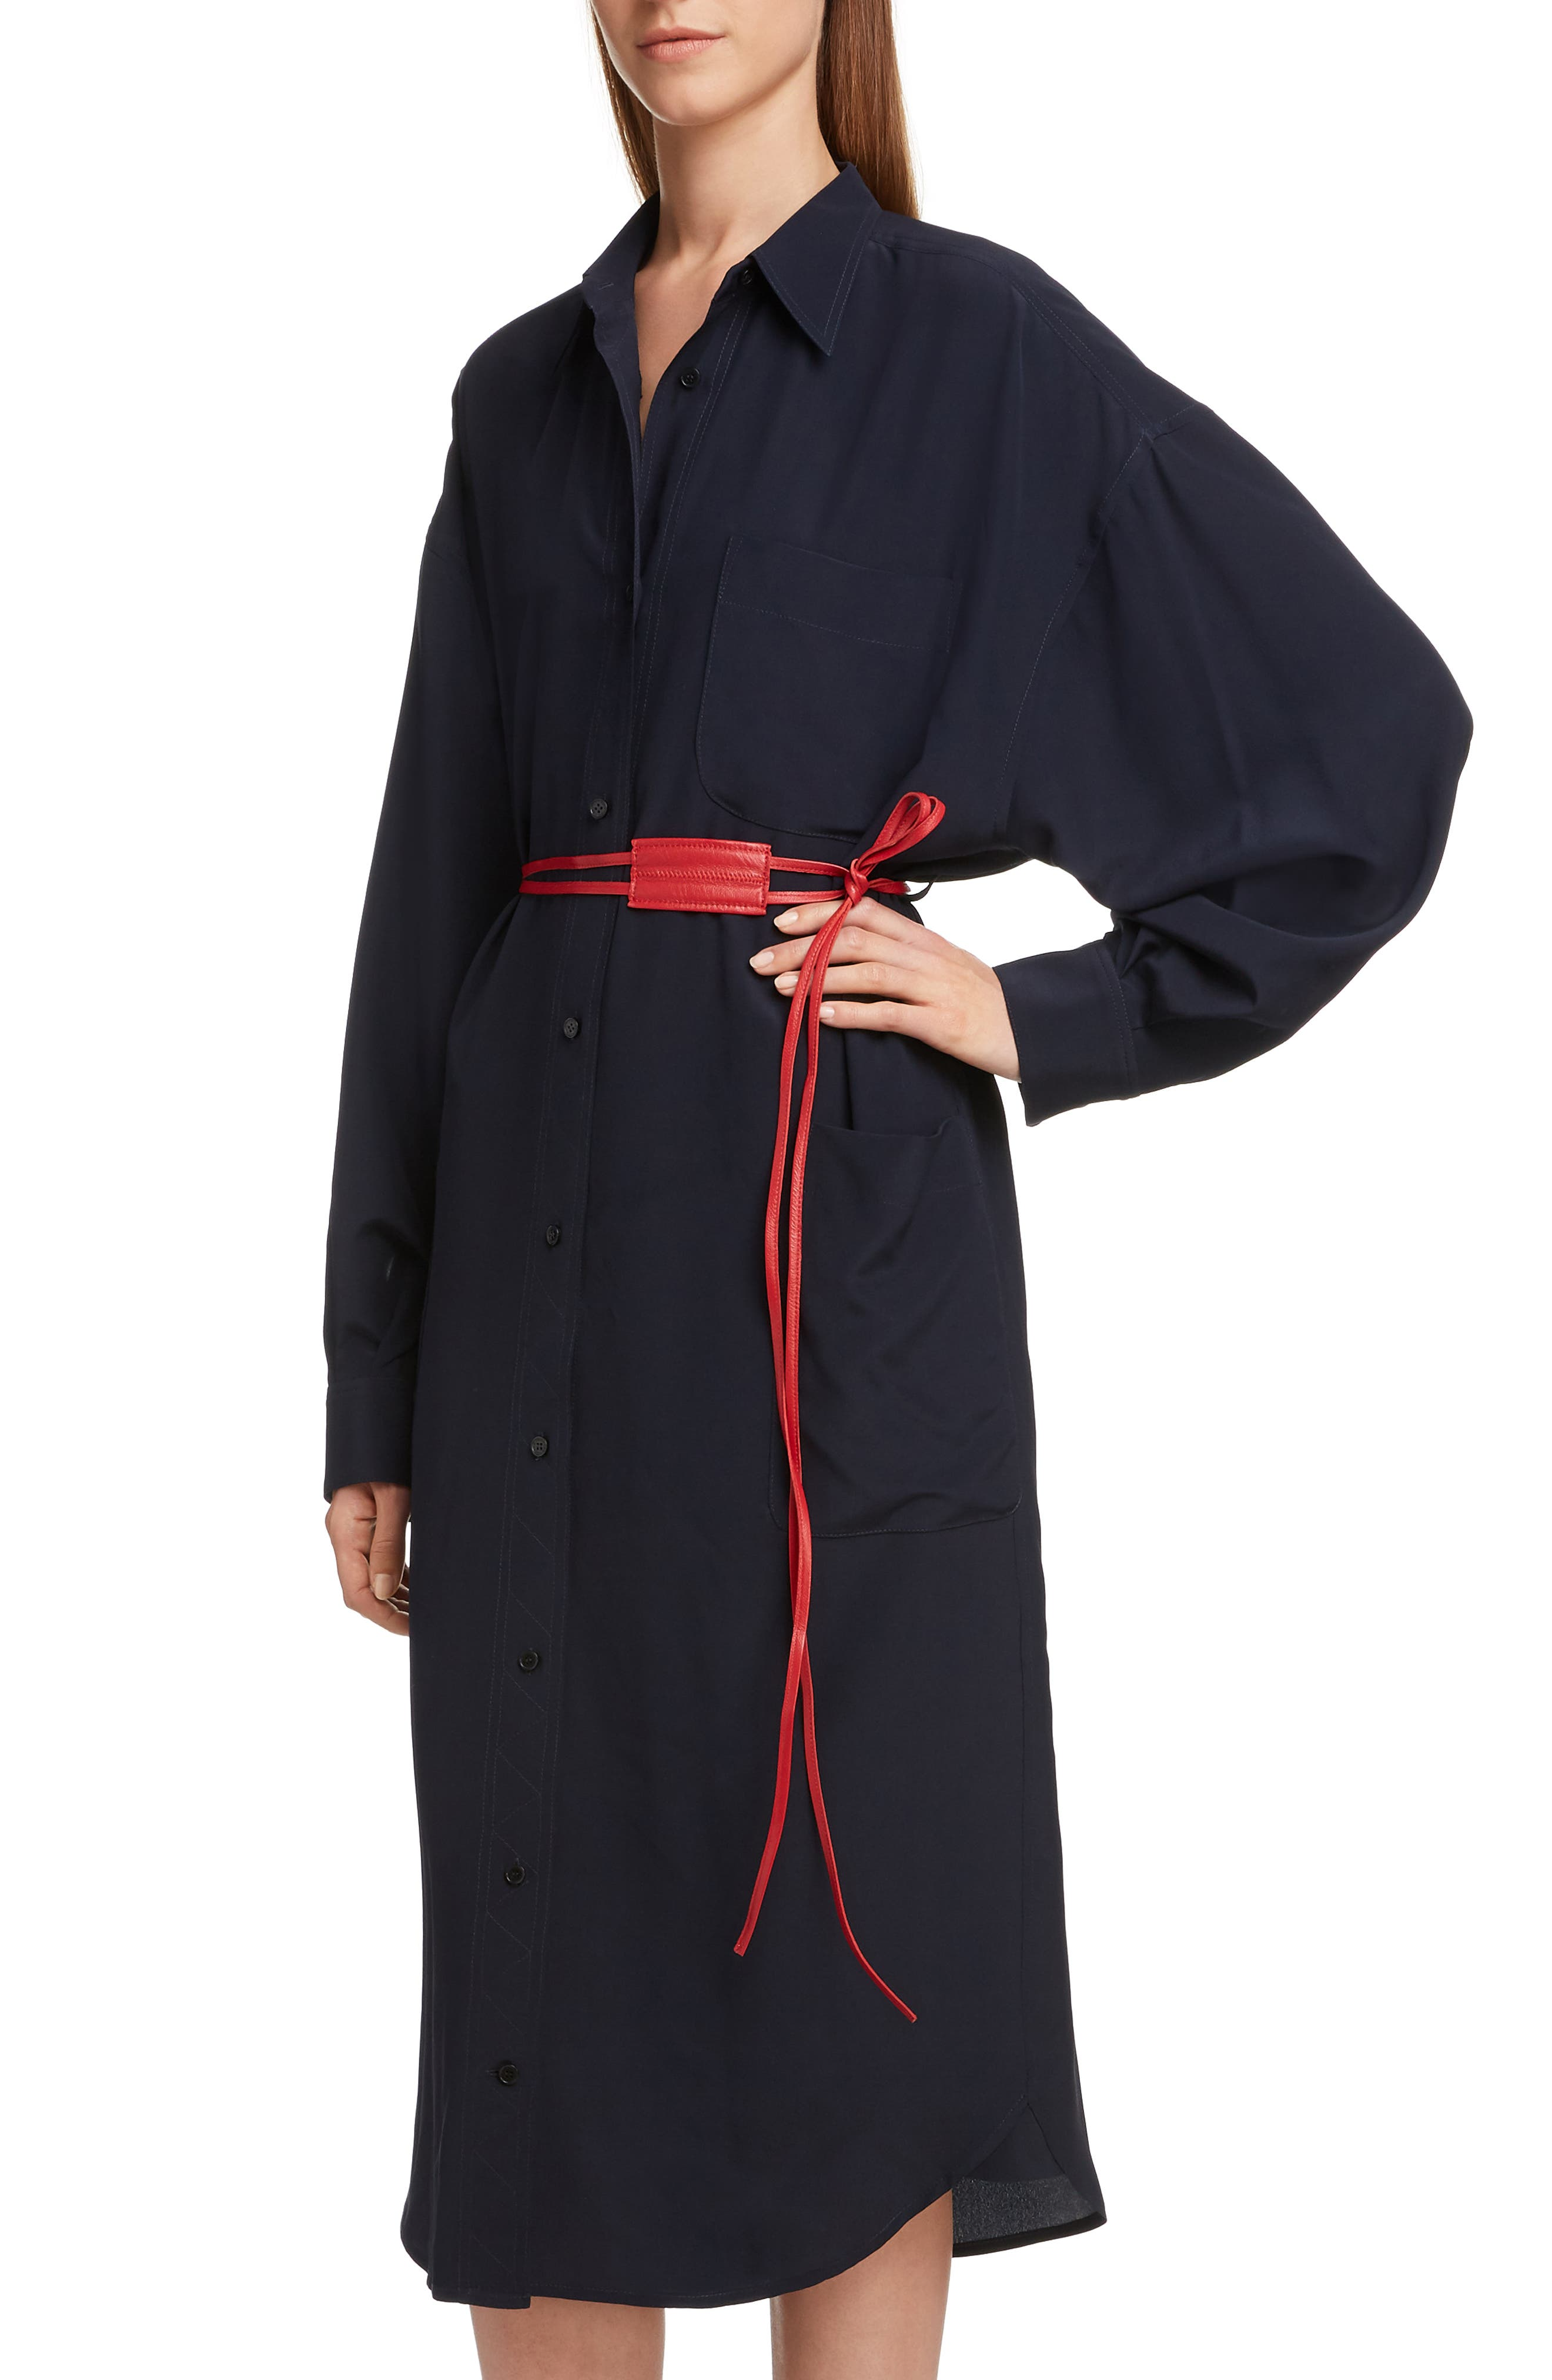 VICTORIA BECKHAM, Belted Silk Shirtdress, Alternate thumbnail 4, color, NAVY/ RED